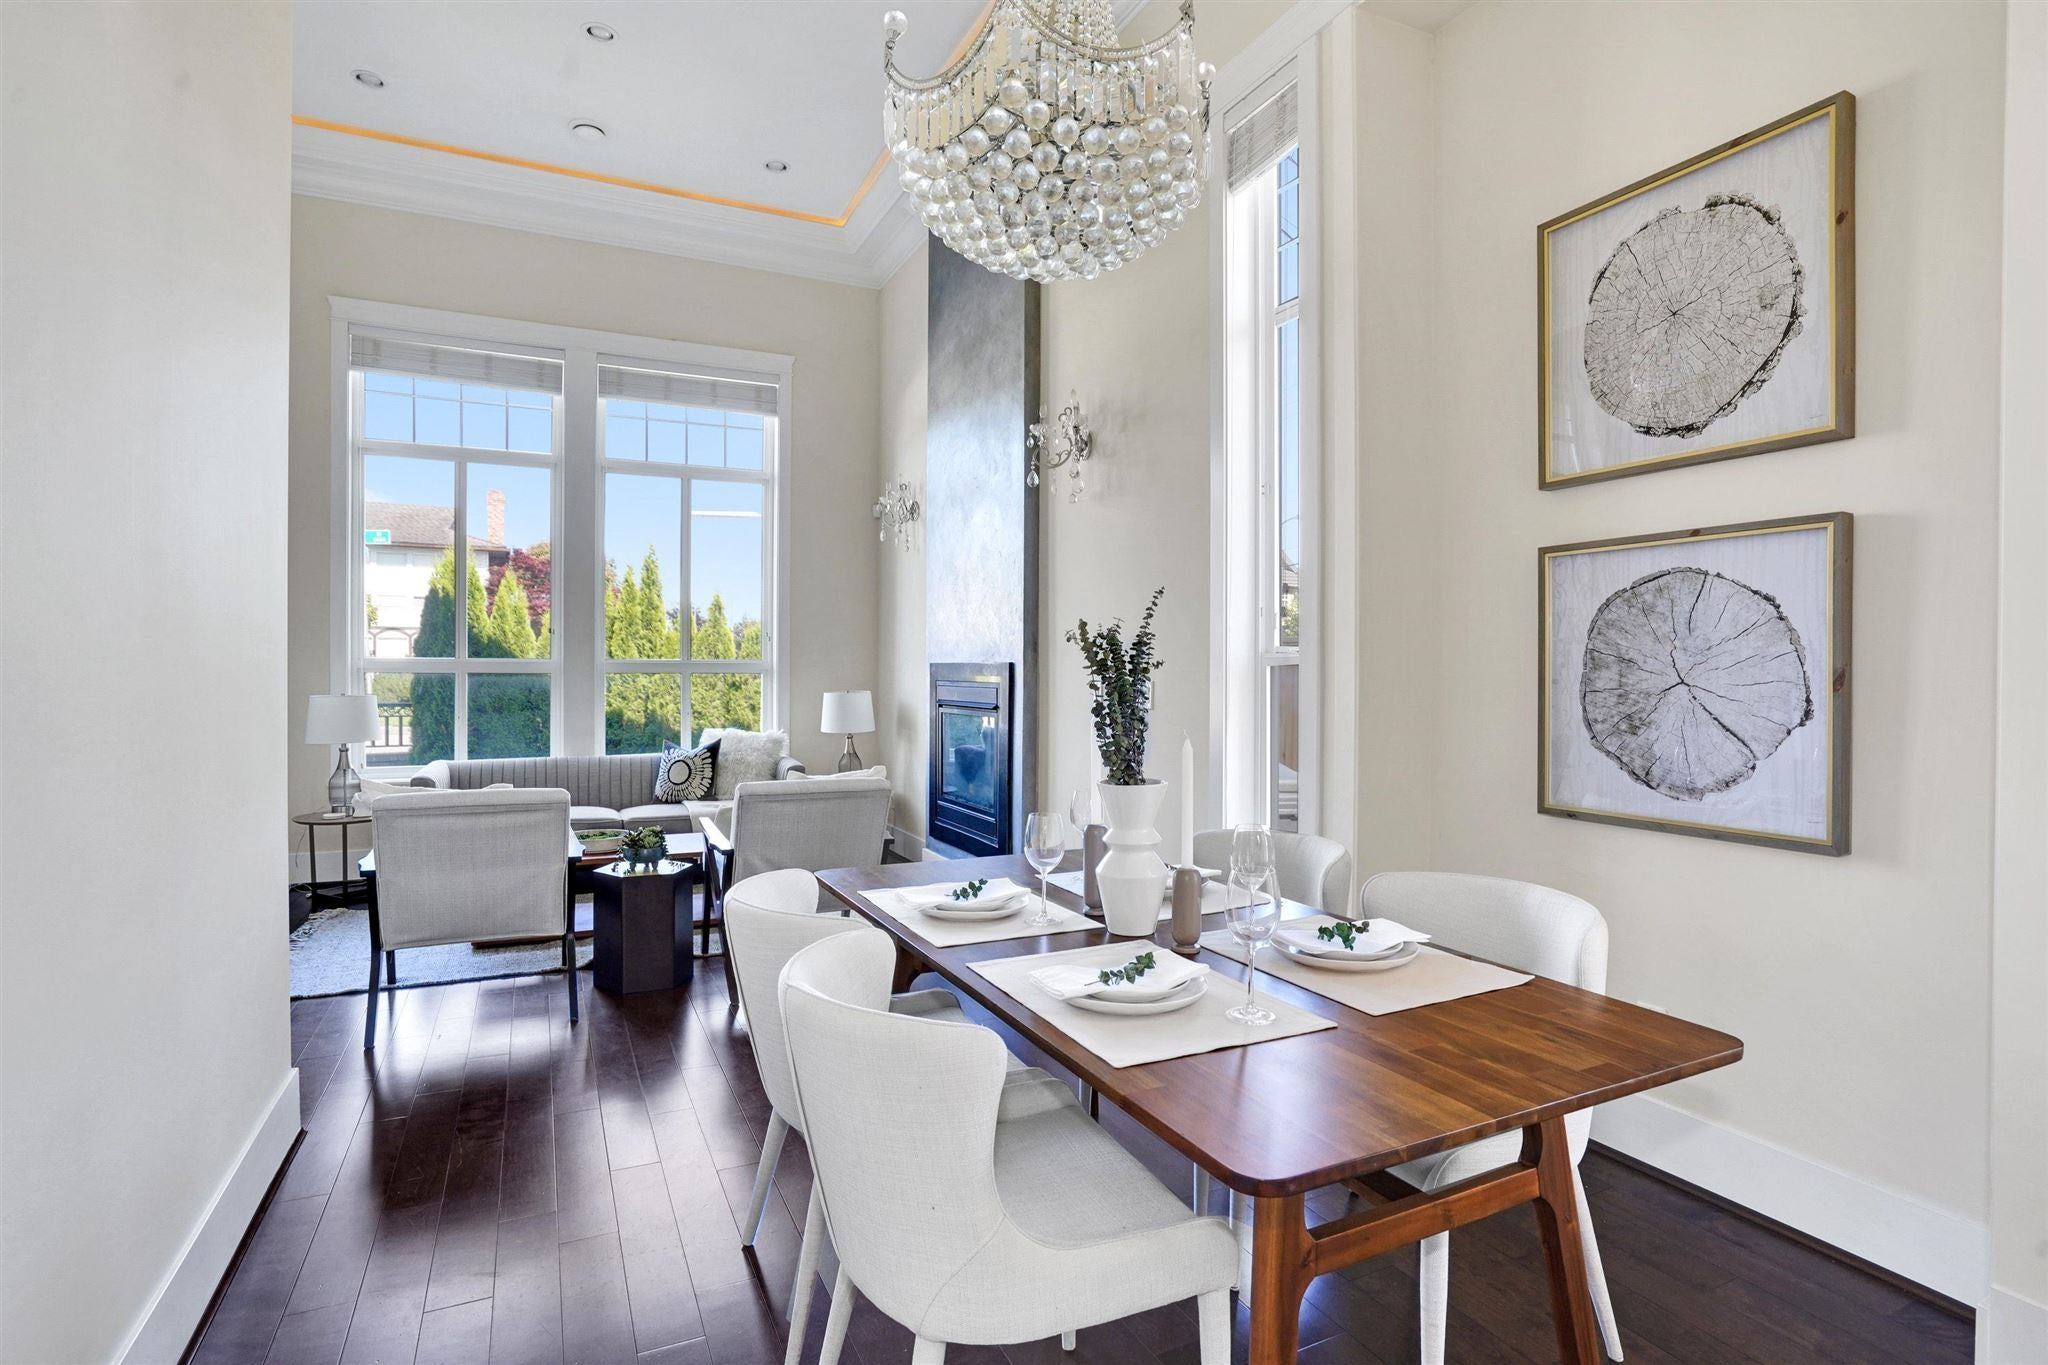 8899 ASH STREET - Garden City House/Single Family for sale, 5 Bedrooms (R2602142)